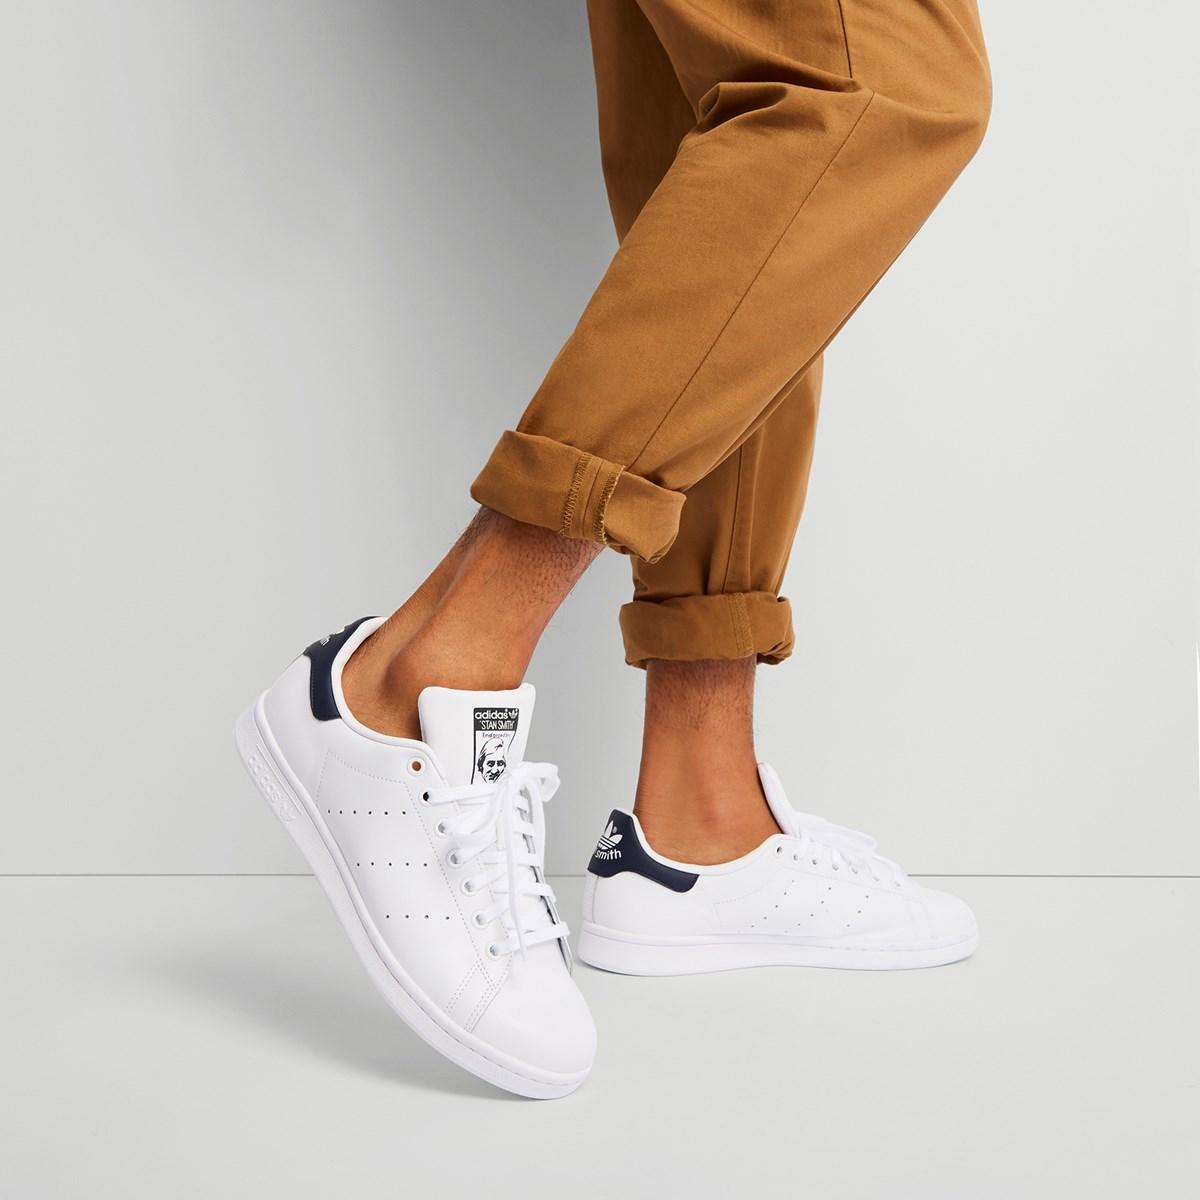 Men's Stan Smith Sneakers in White